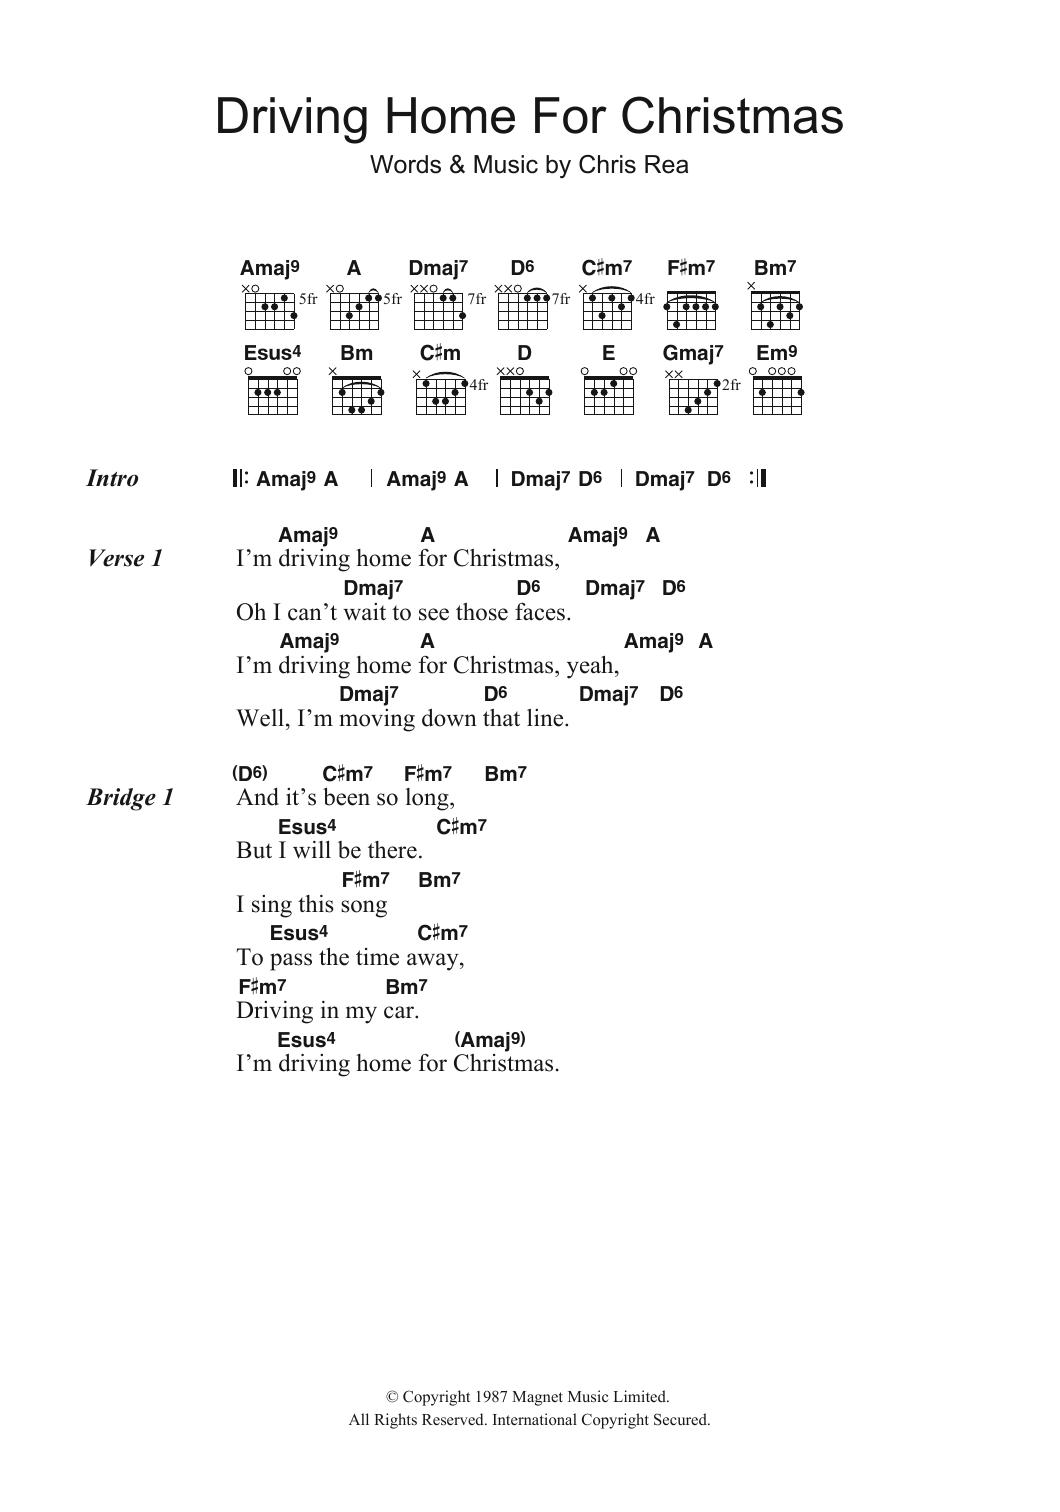 Guitar chord sheet music at stantons sheet music hexwebz Gallery